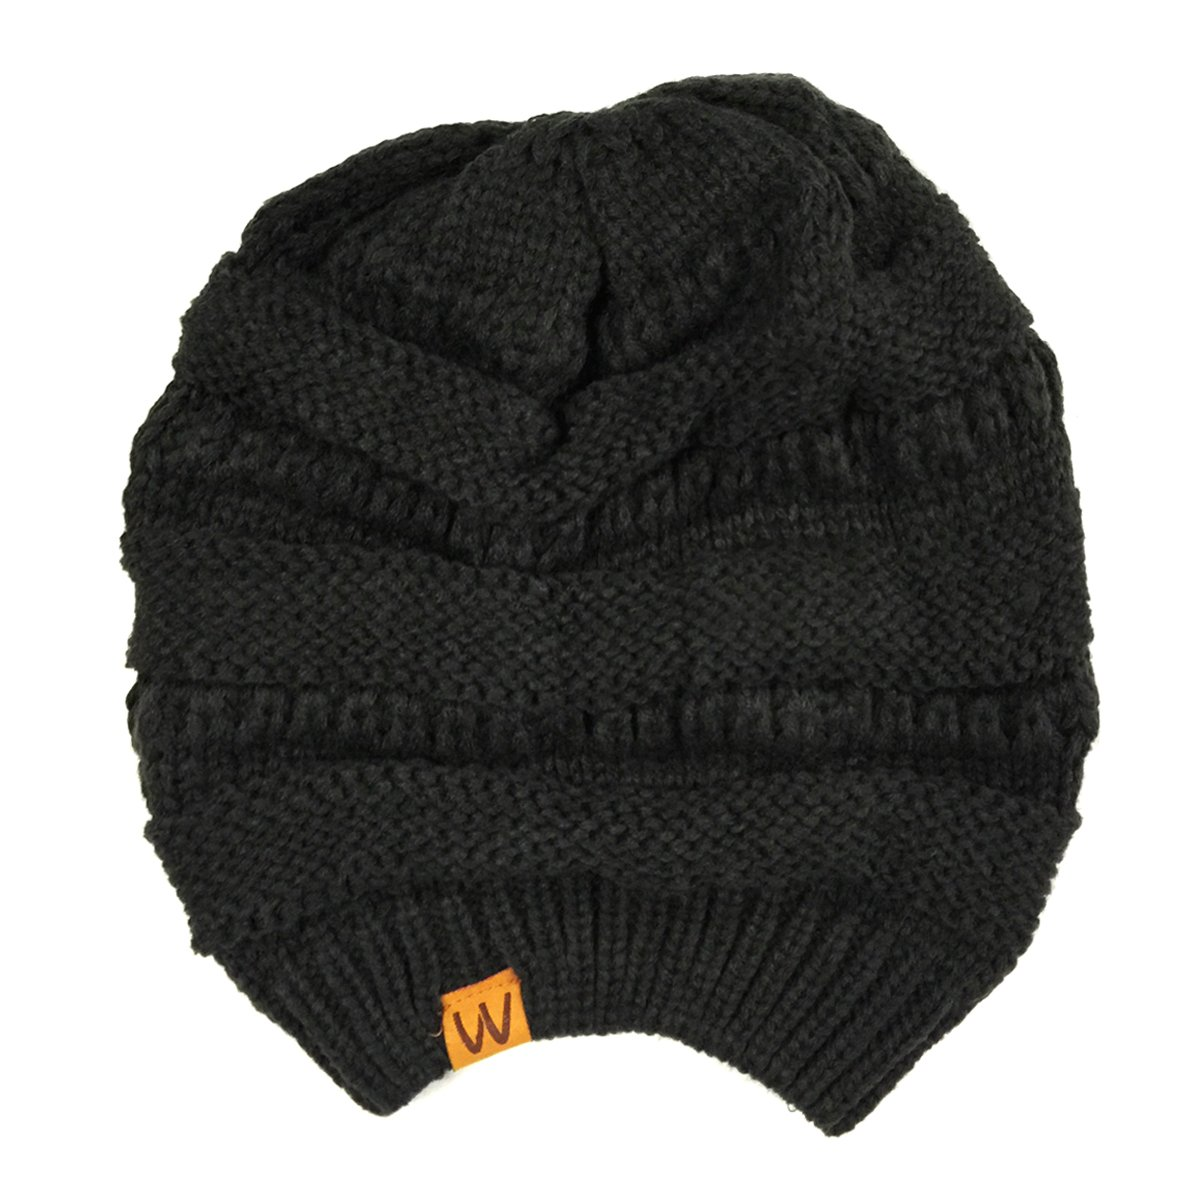 pretty nice 06b0b 2b868 Amazon.com  Wrapables Slouchy Winter Beanie Cap Hat, Black  Clothing